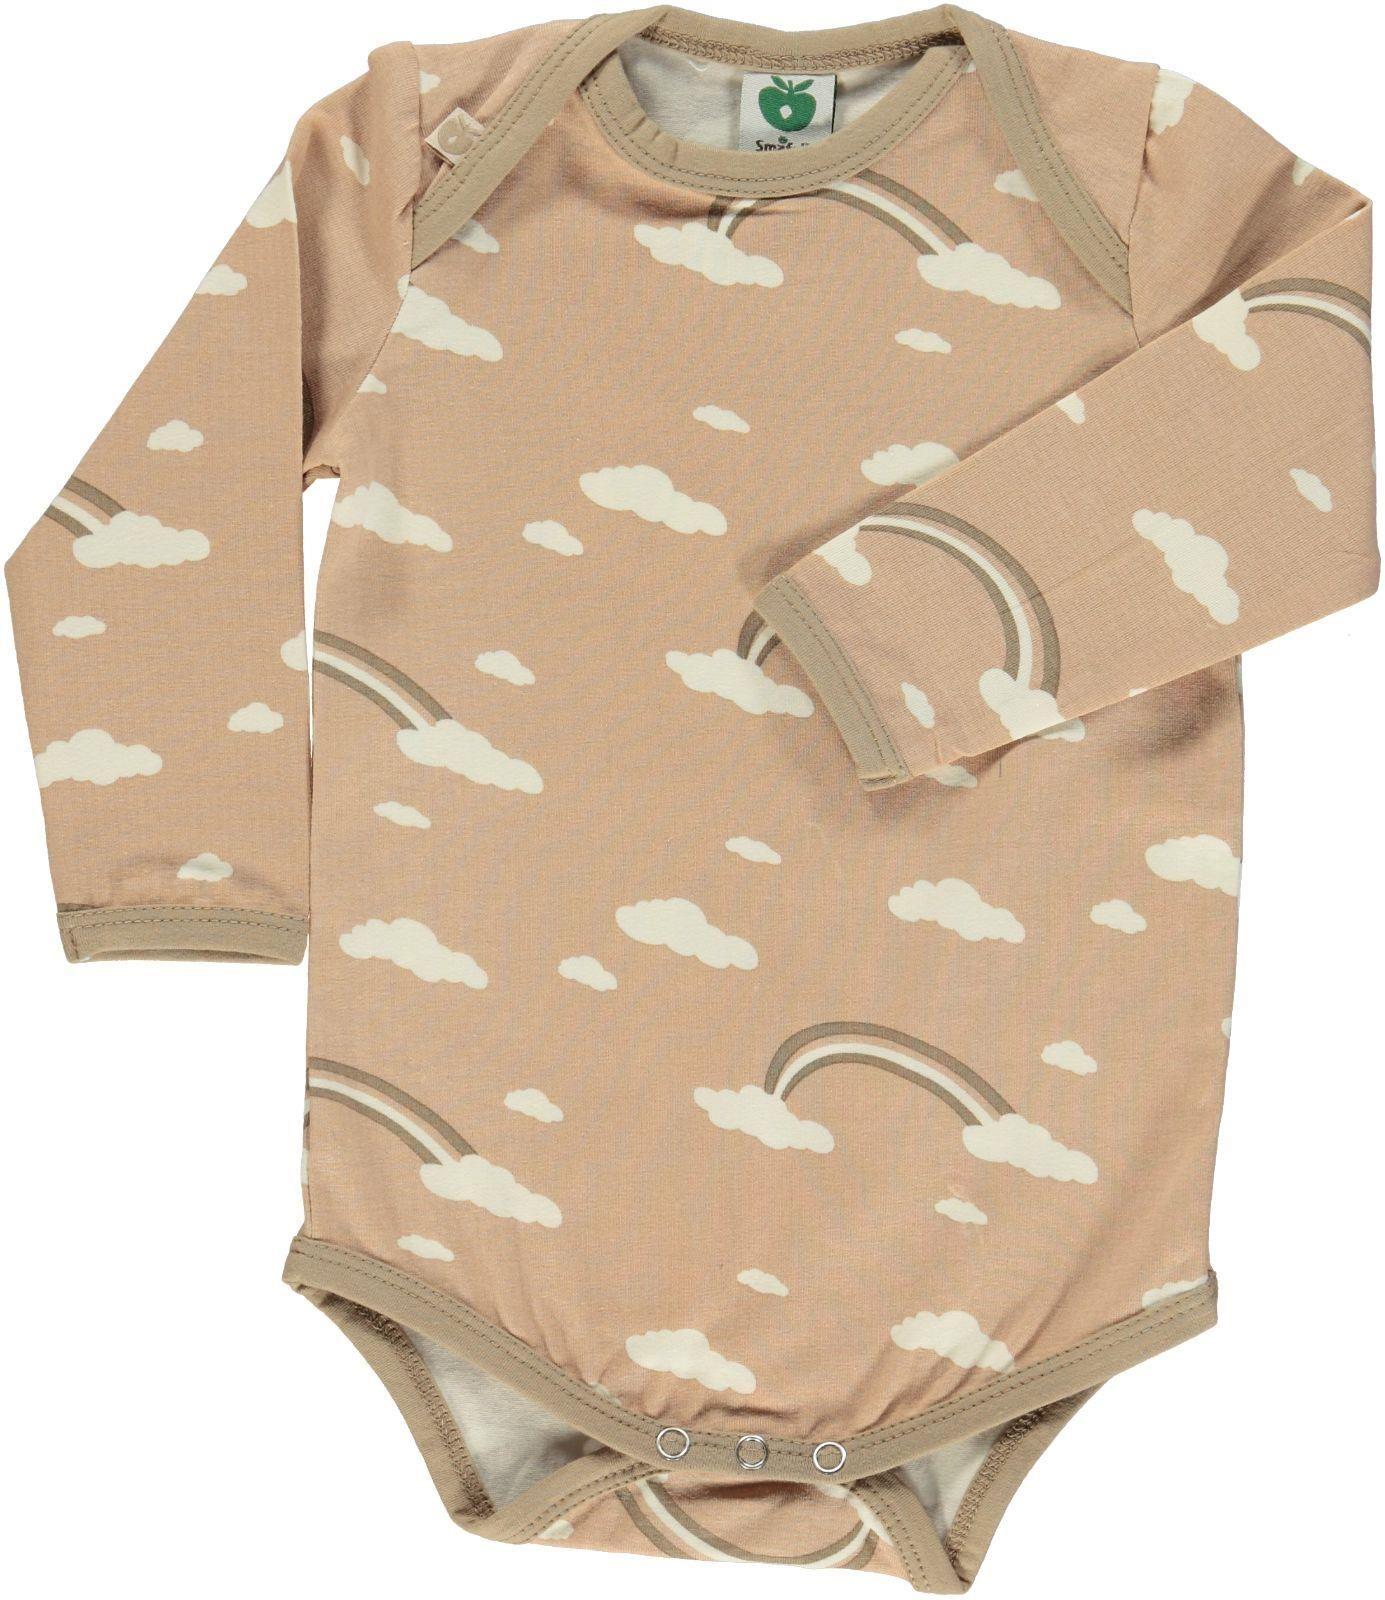 Smafolk l s bodysuit Rainbow Sand Retro Baby Clothes Baby Boy